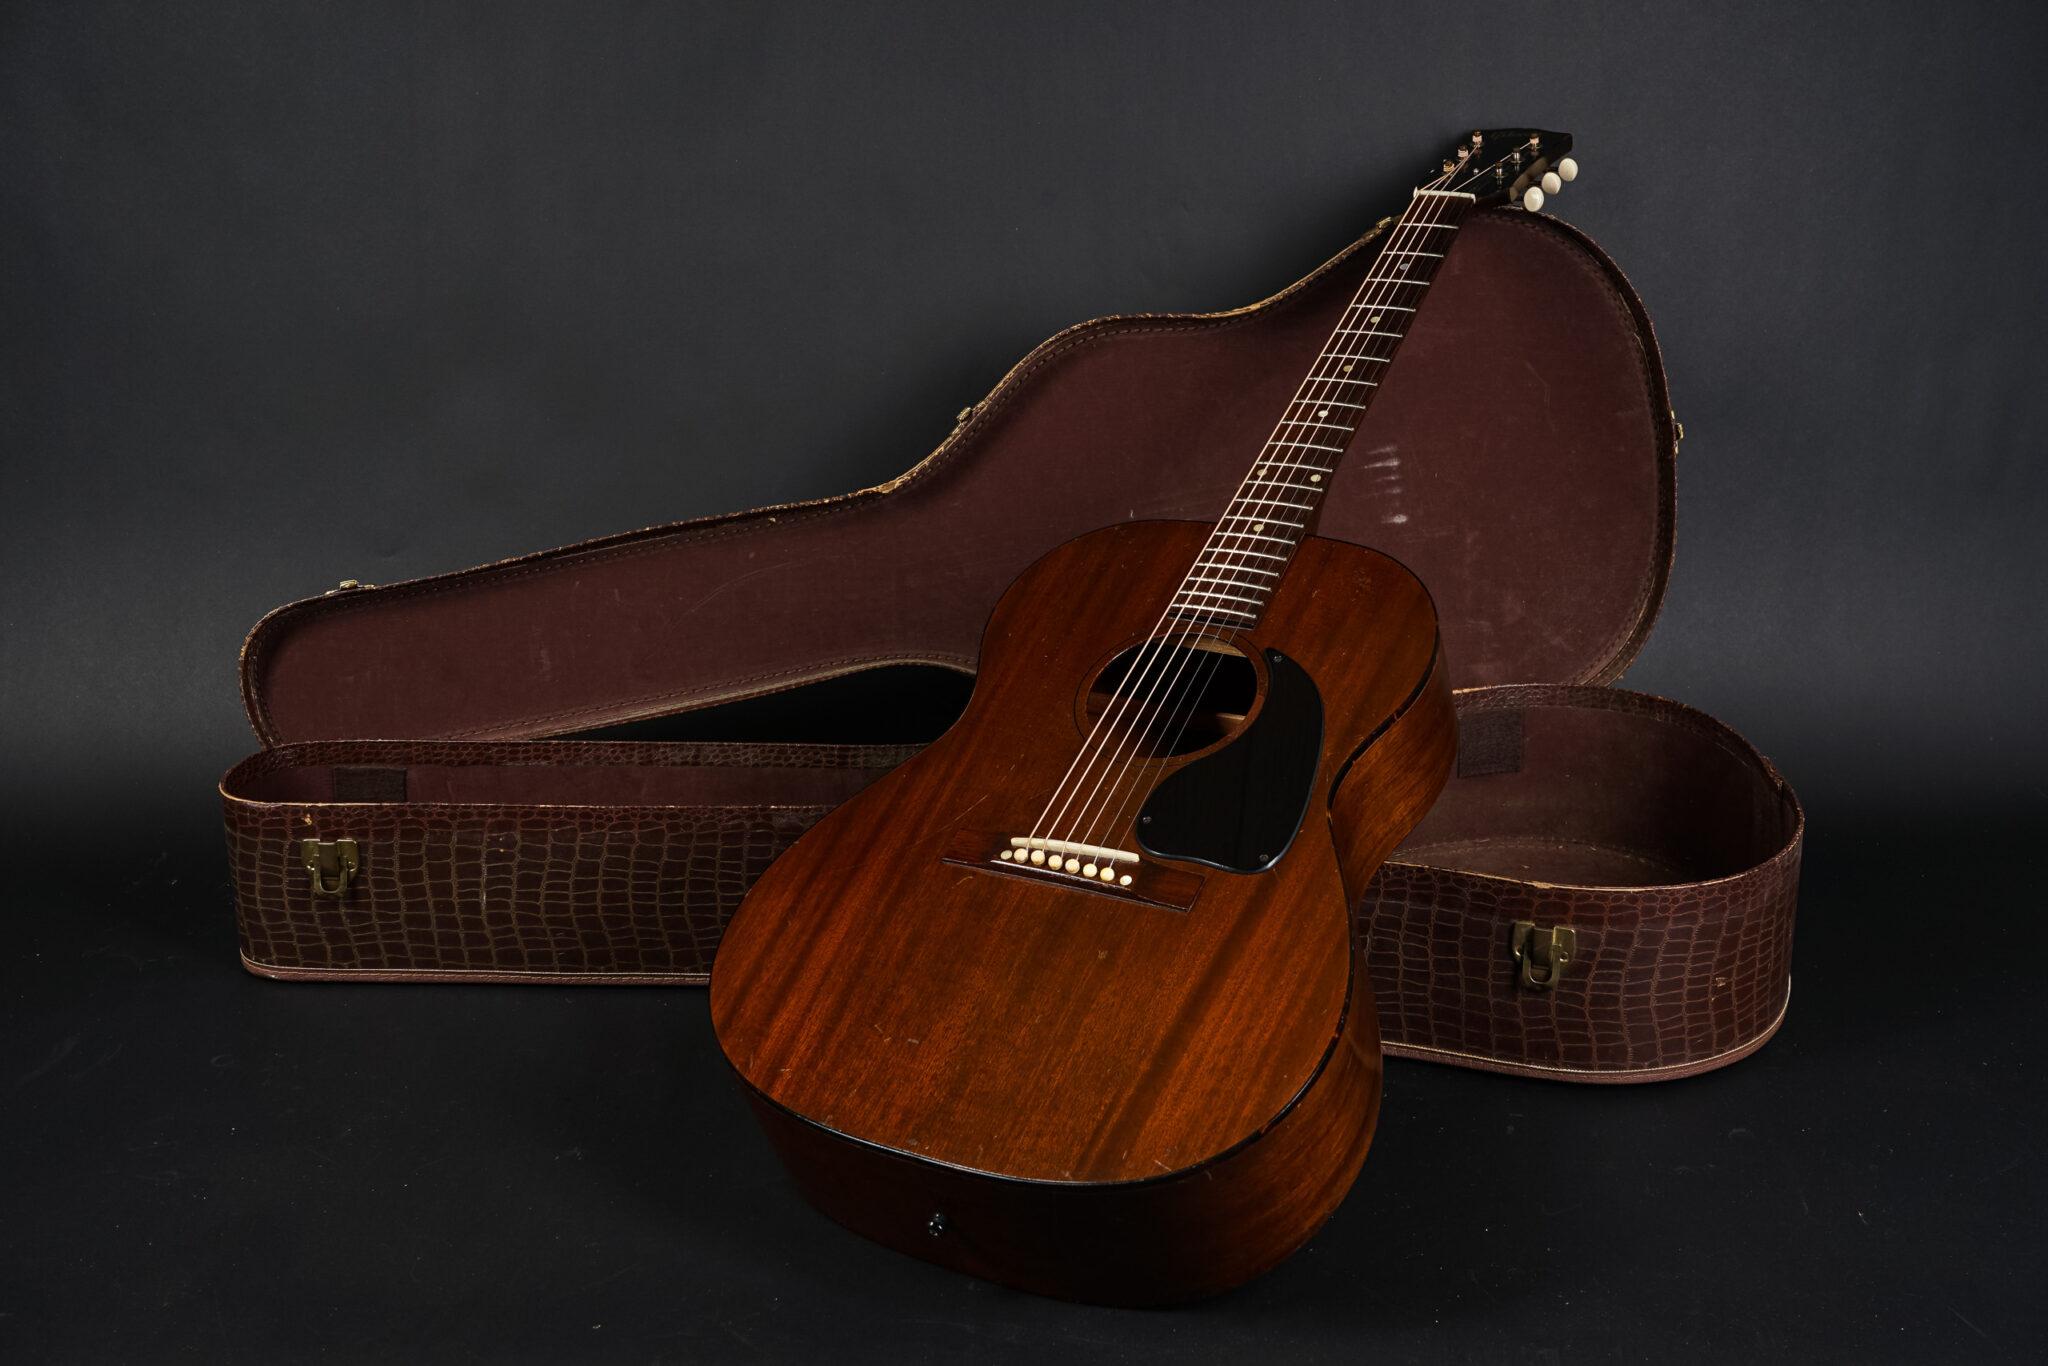 https://guitarpoint.de/app/uploads/products/1960-gibson-lg-0-natural/1960-Gibson-LG0-Nat-11-2048x1366.jpg